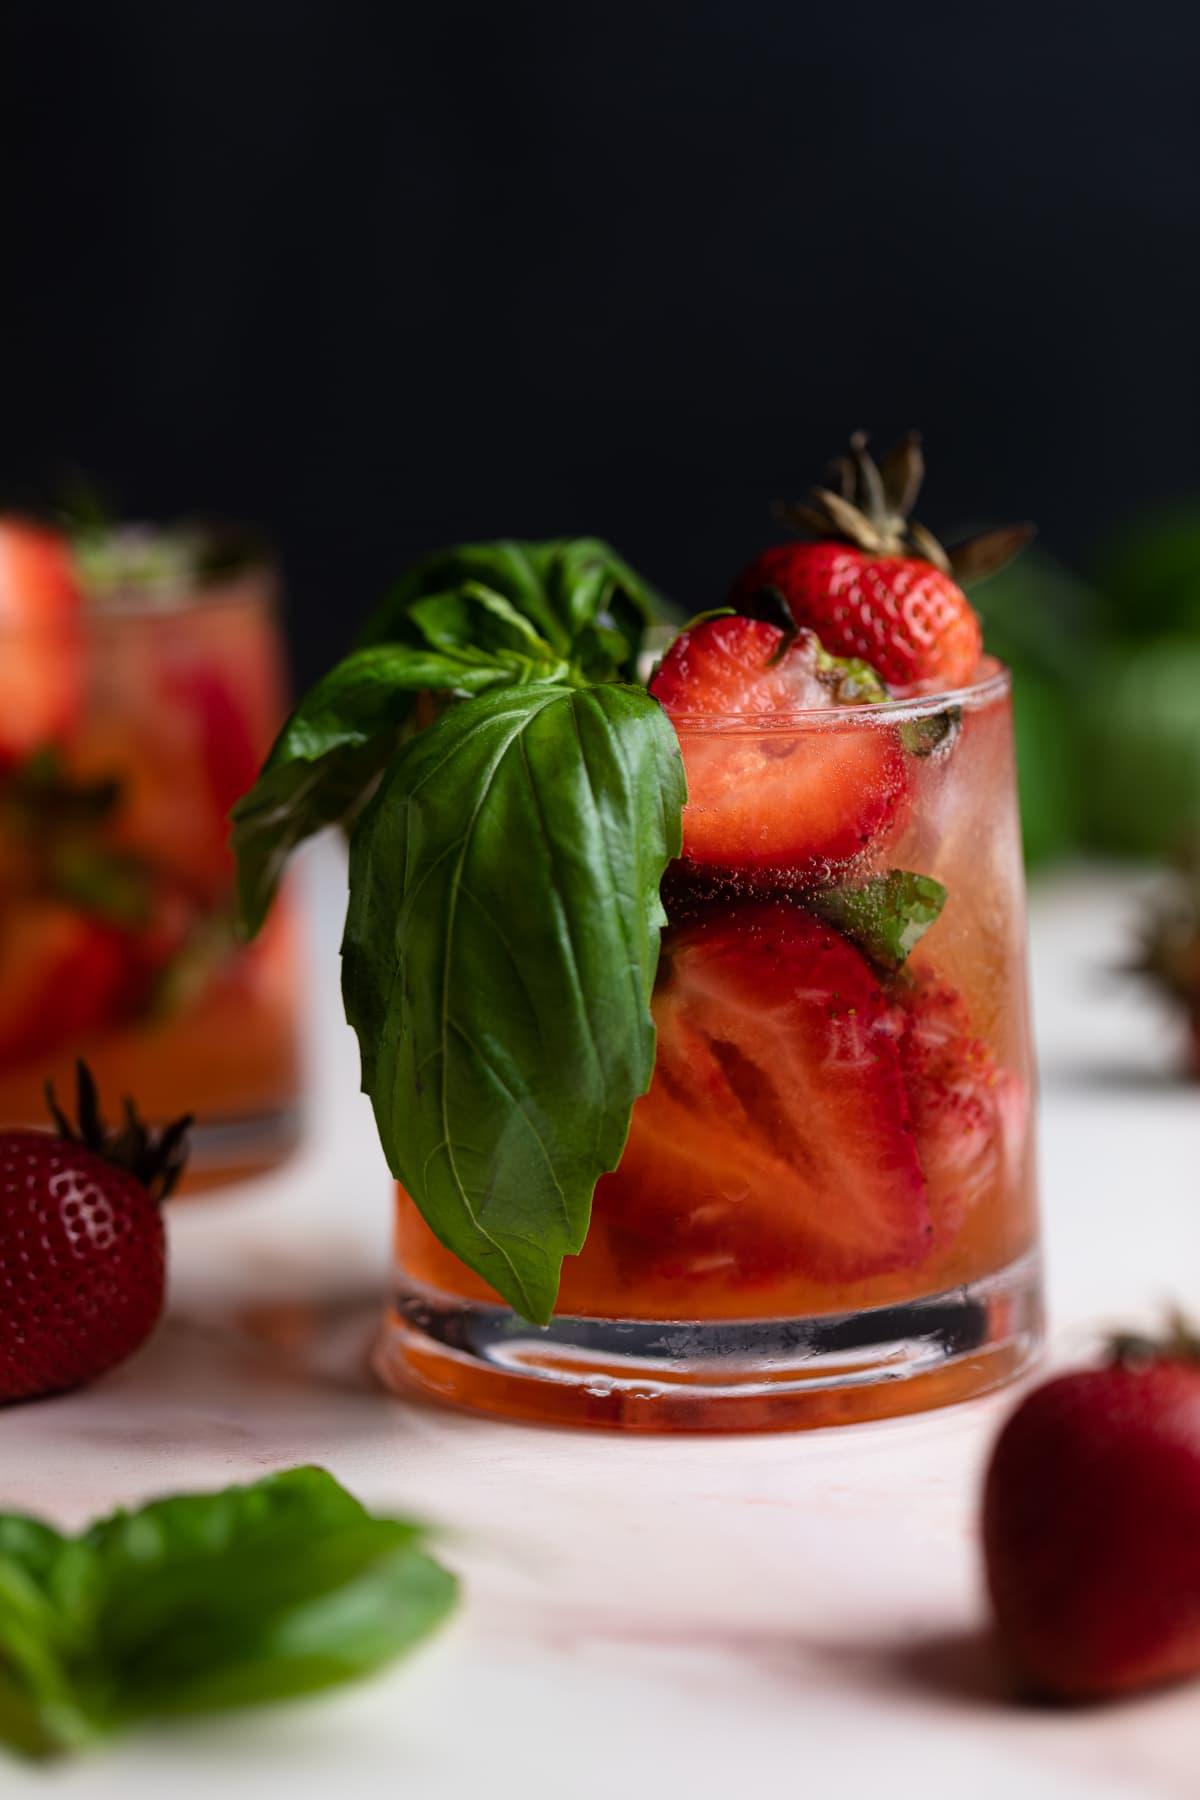 Strawberry Basil Pineapple MocktailStrawberry Basil Pineapple Mocktail in a glass with fresh strawberries and basil